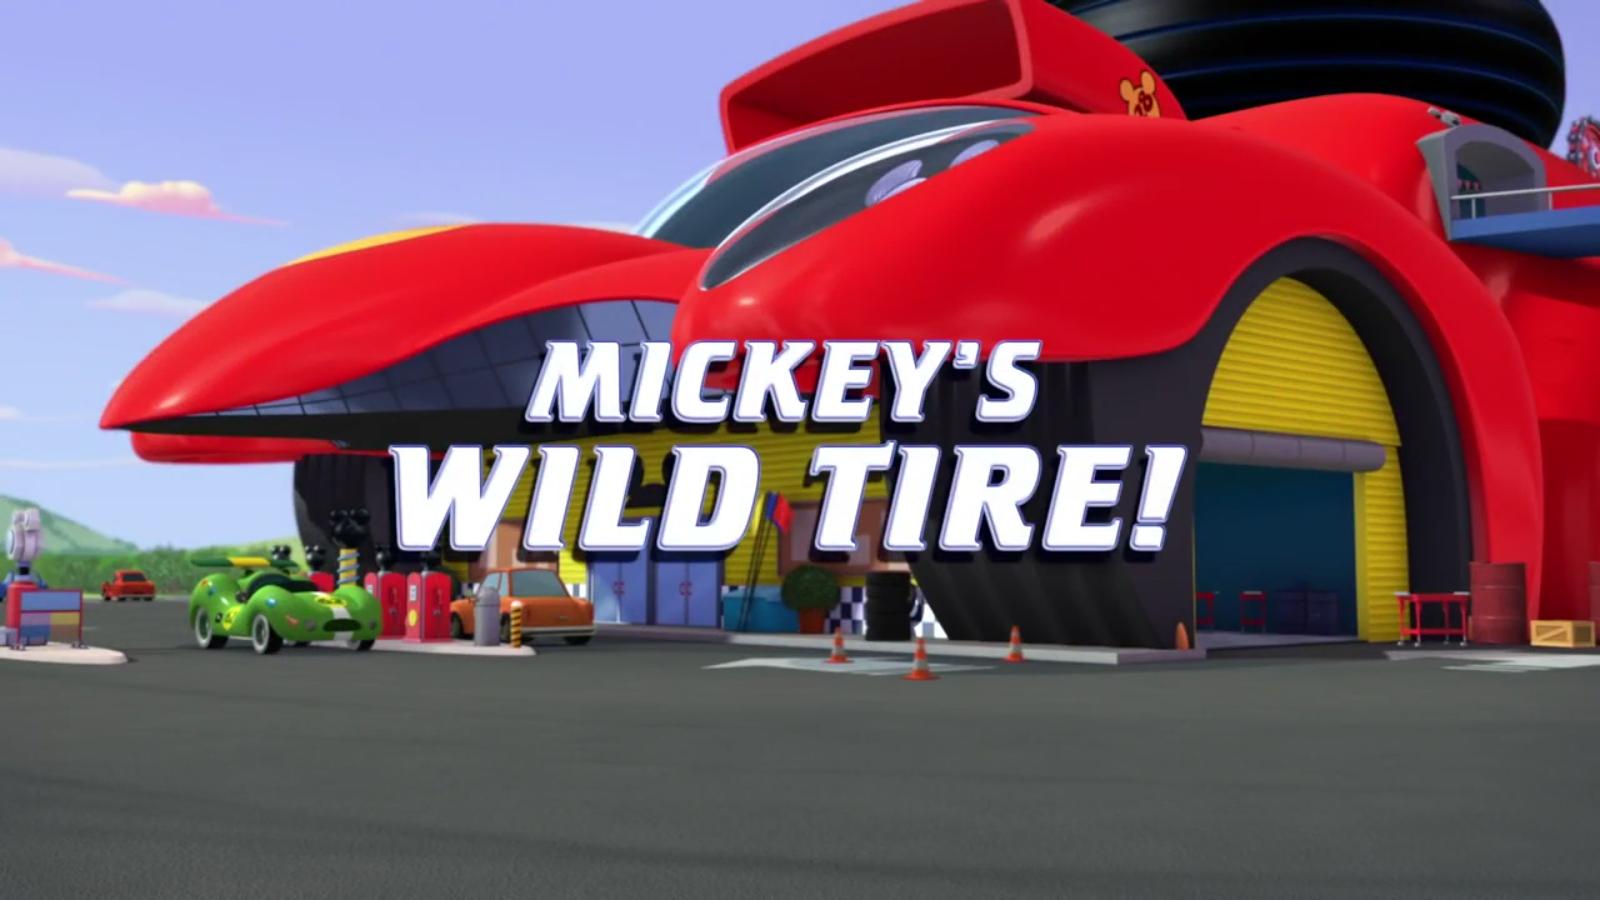 Mickey's Wild Tire!